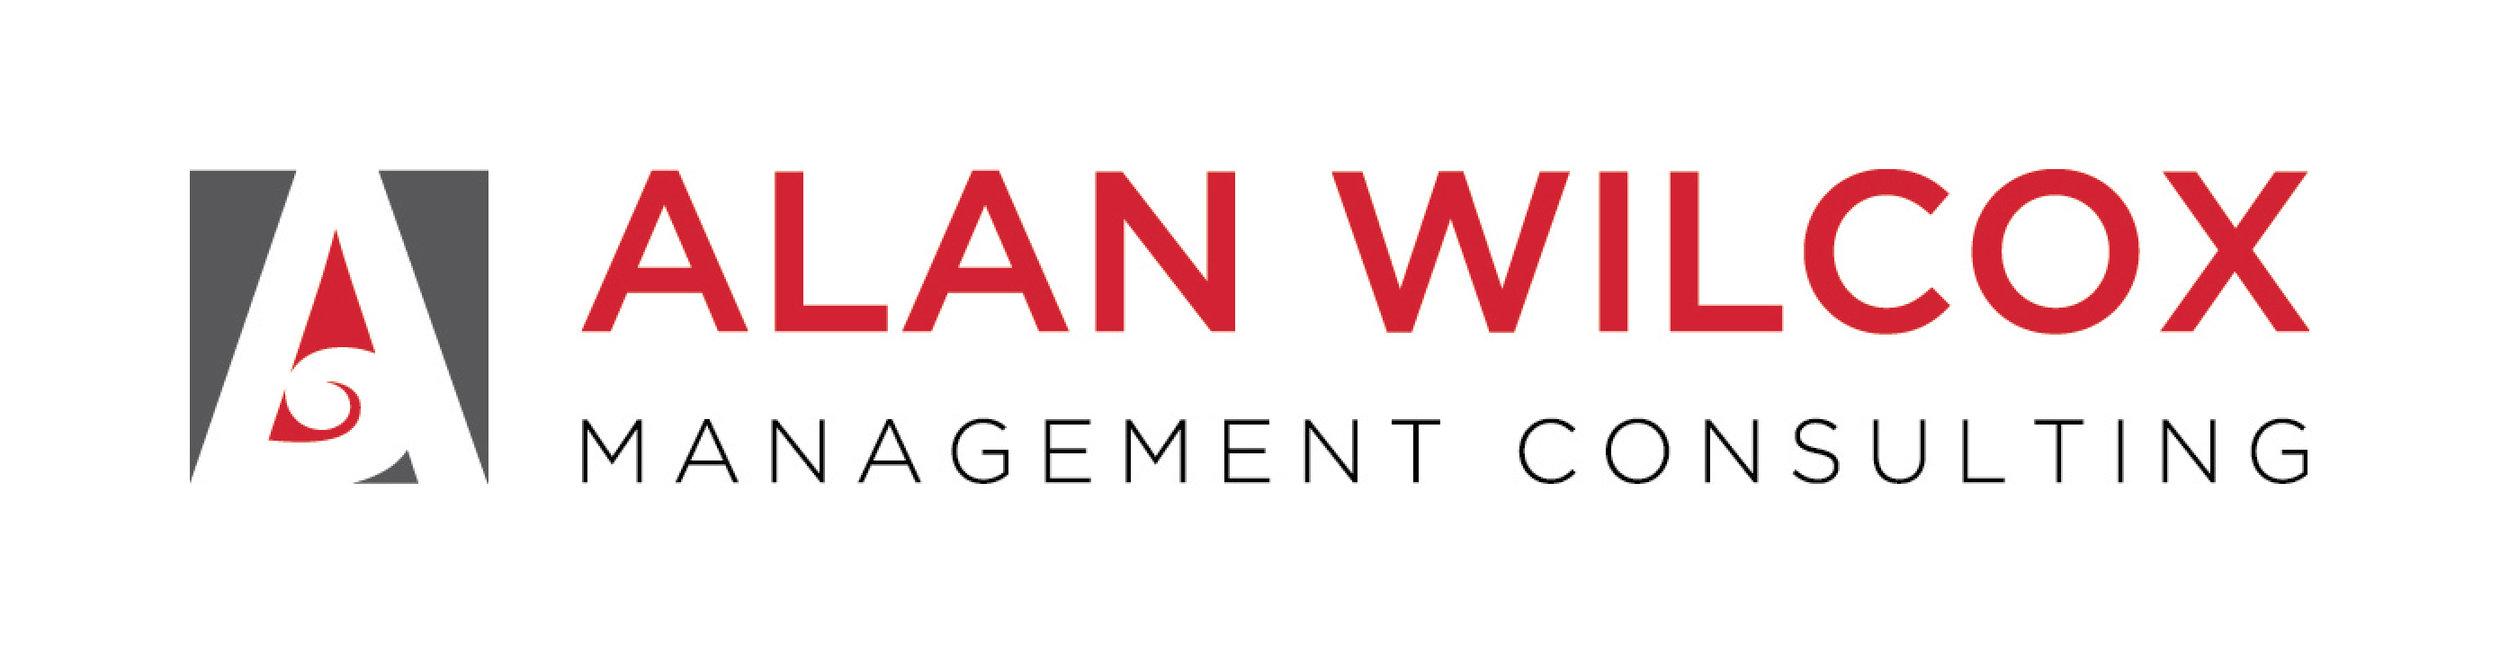 Close up of the logo